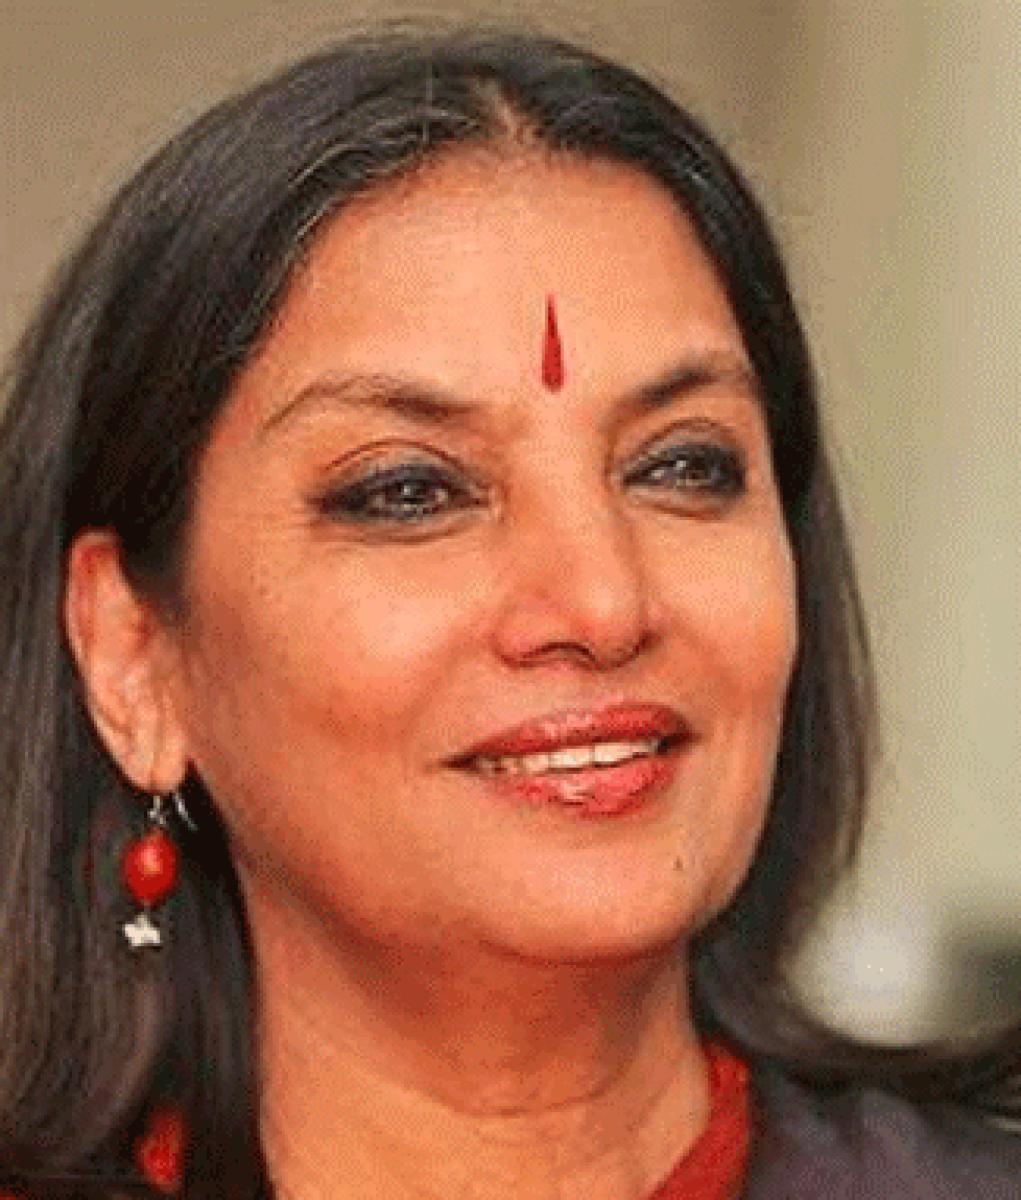 Film industry should boycott IFFI: Shabana Azmi